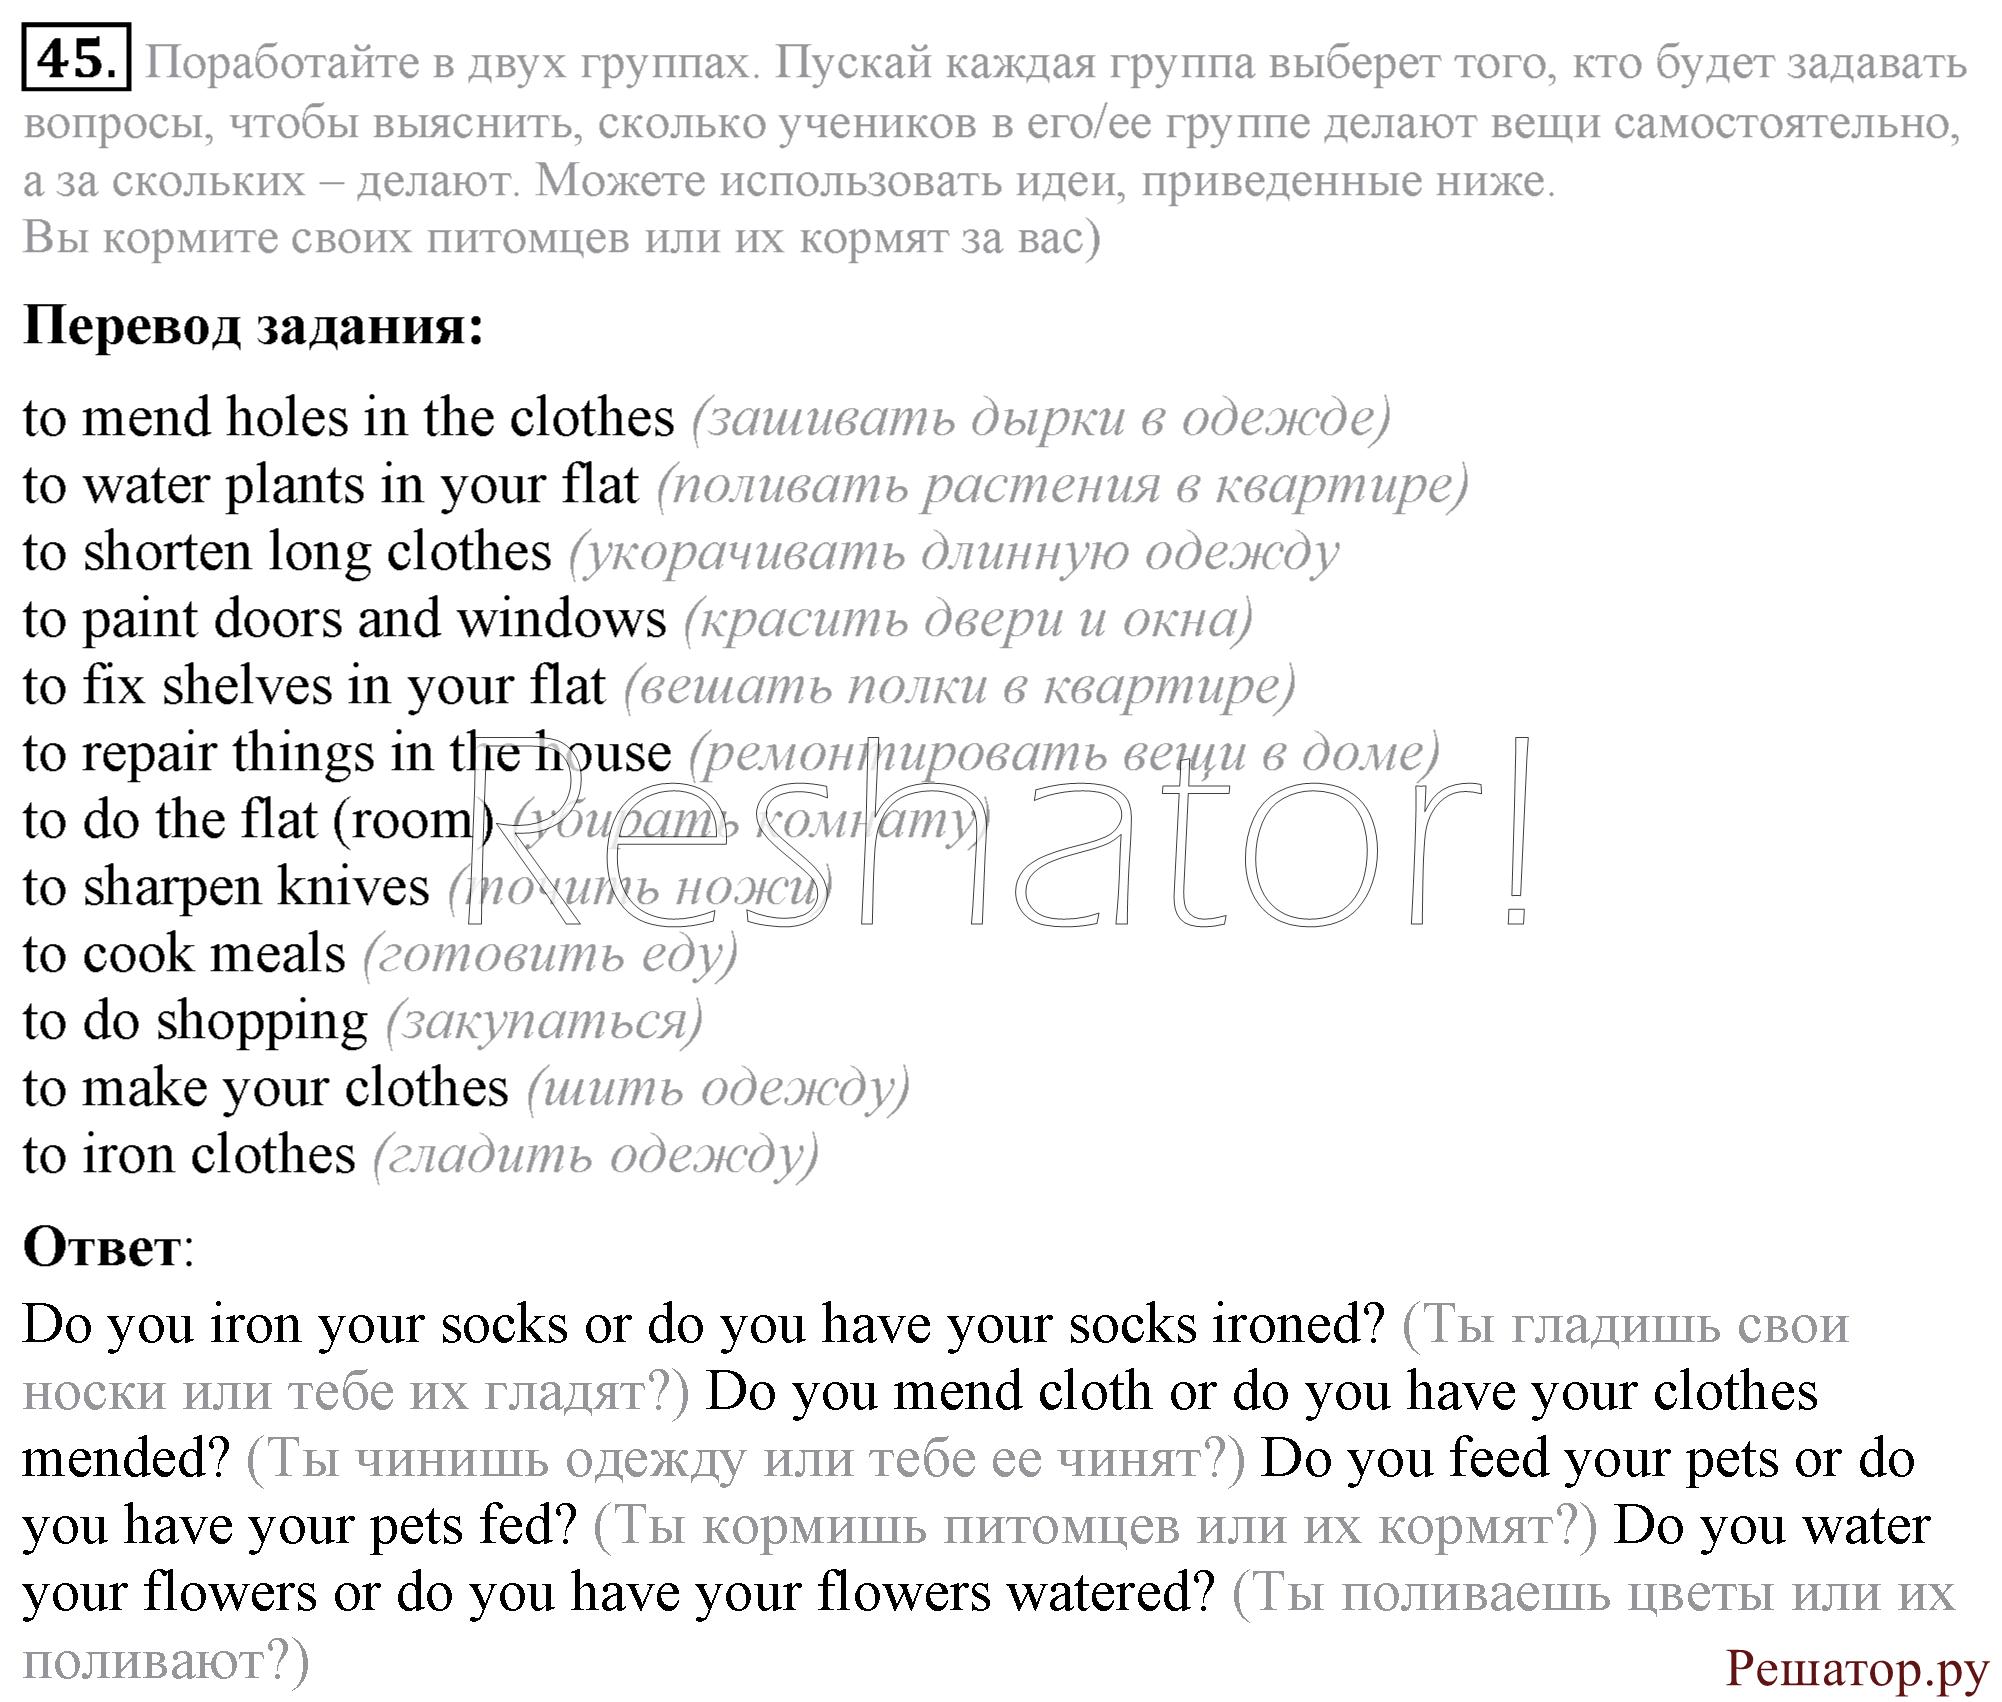 решебник planet of english онлайн